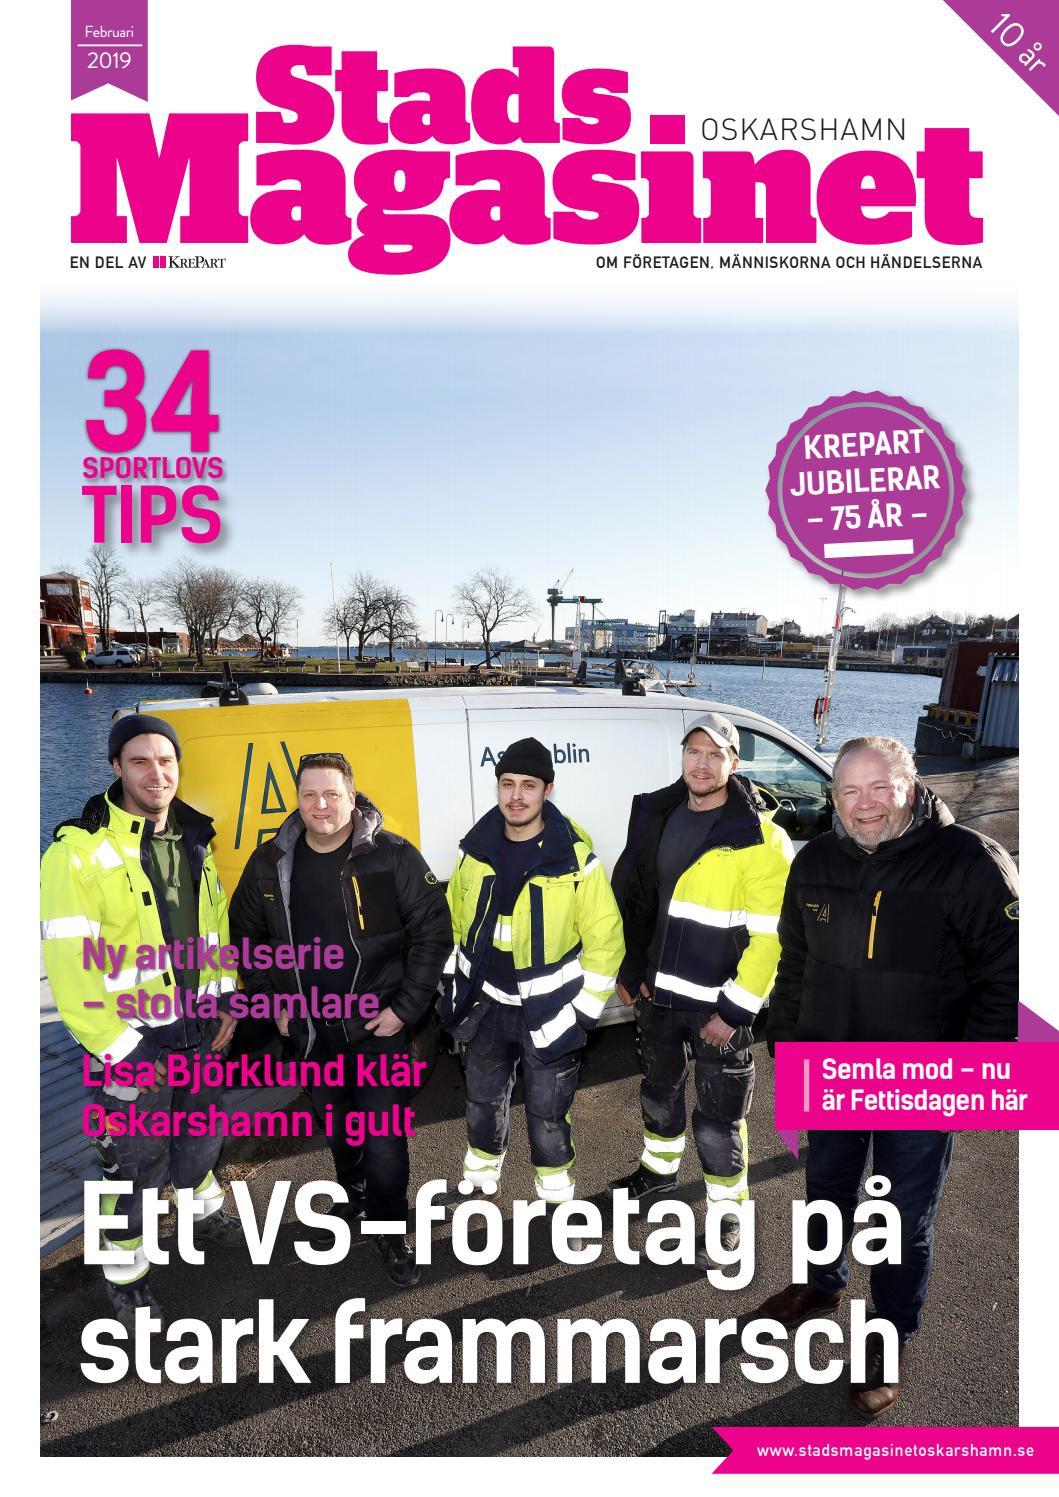 Kustvgen 11 Kalmar ln, Pskallavik - unam.net